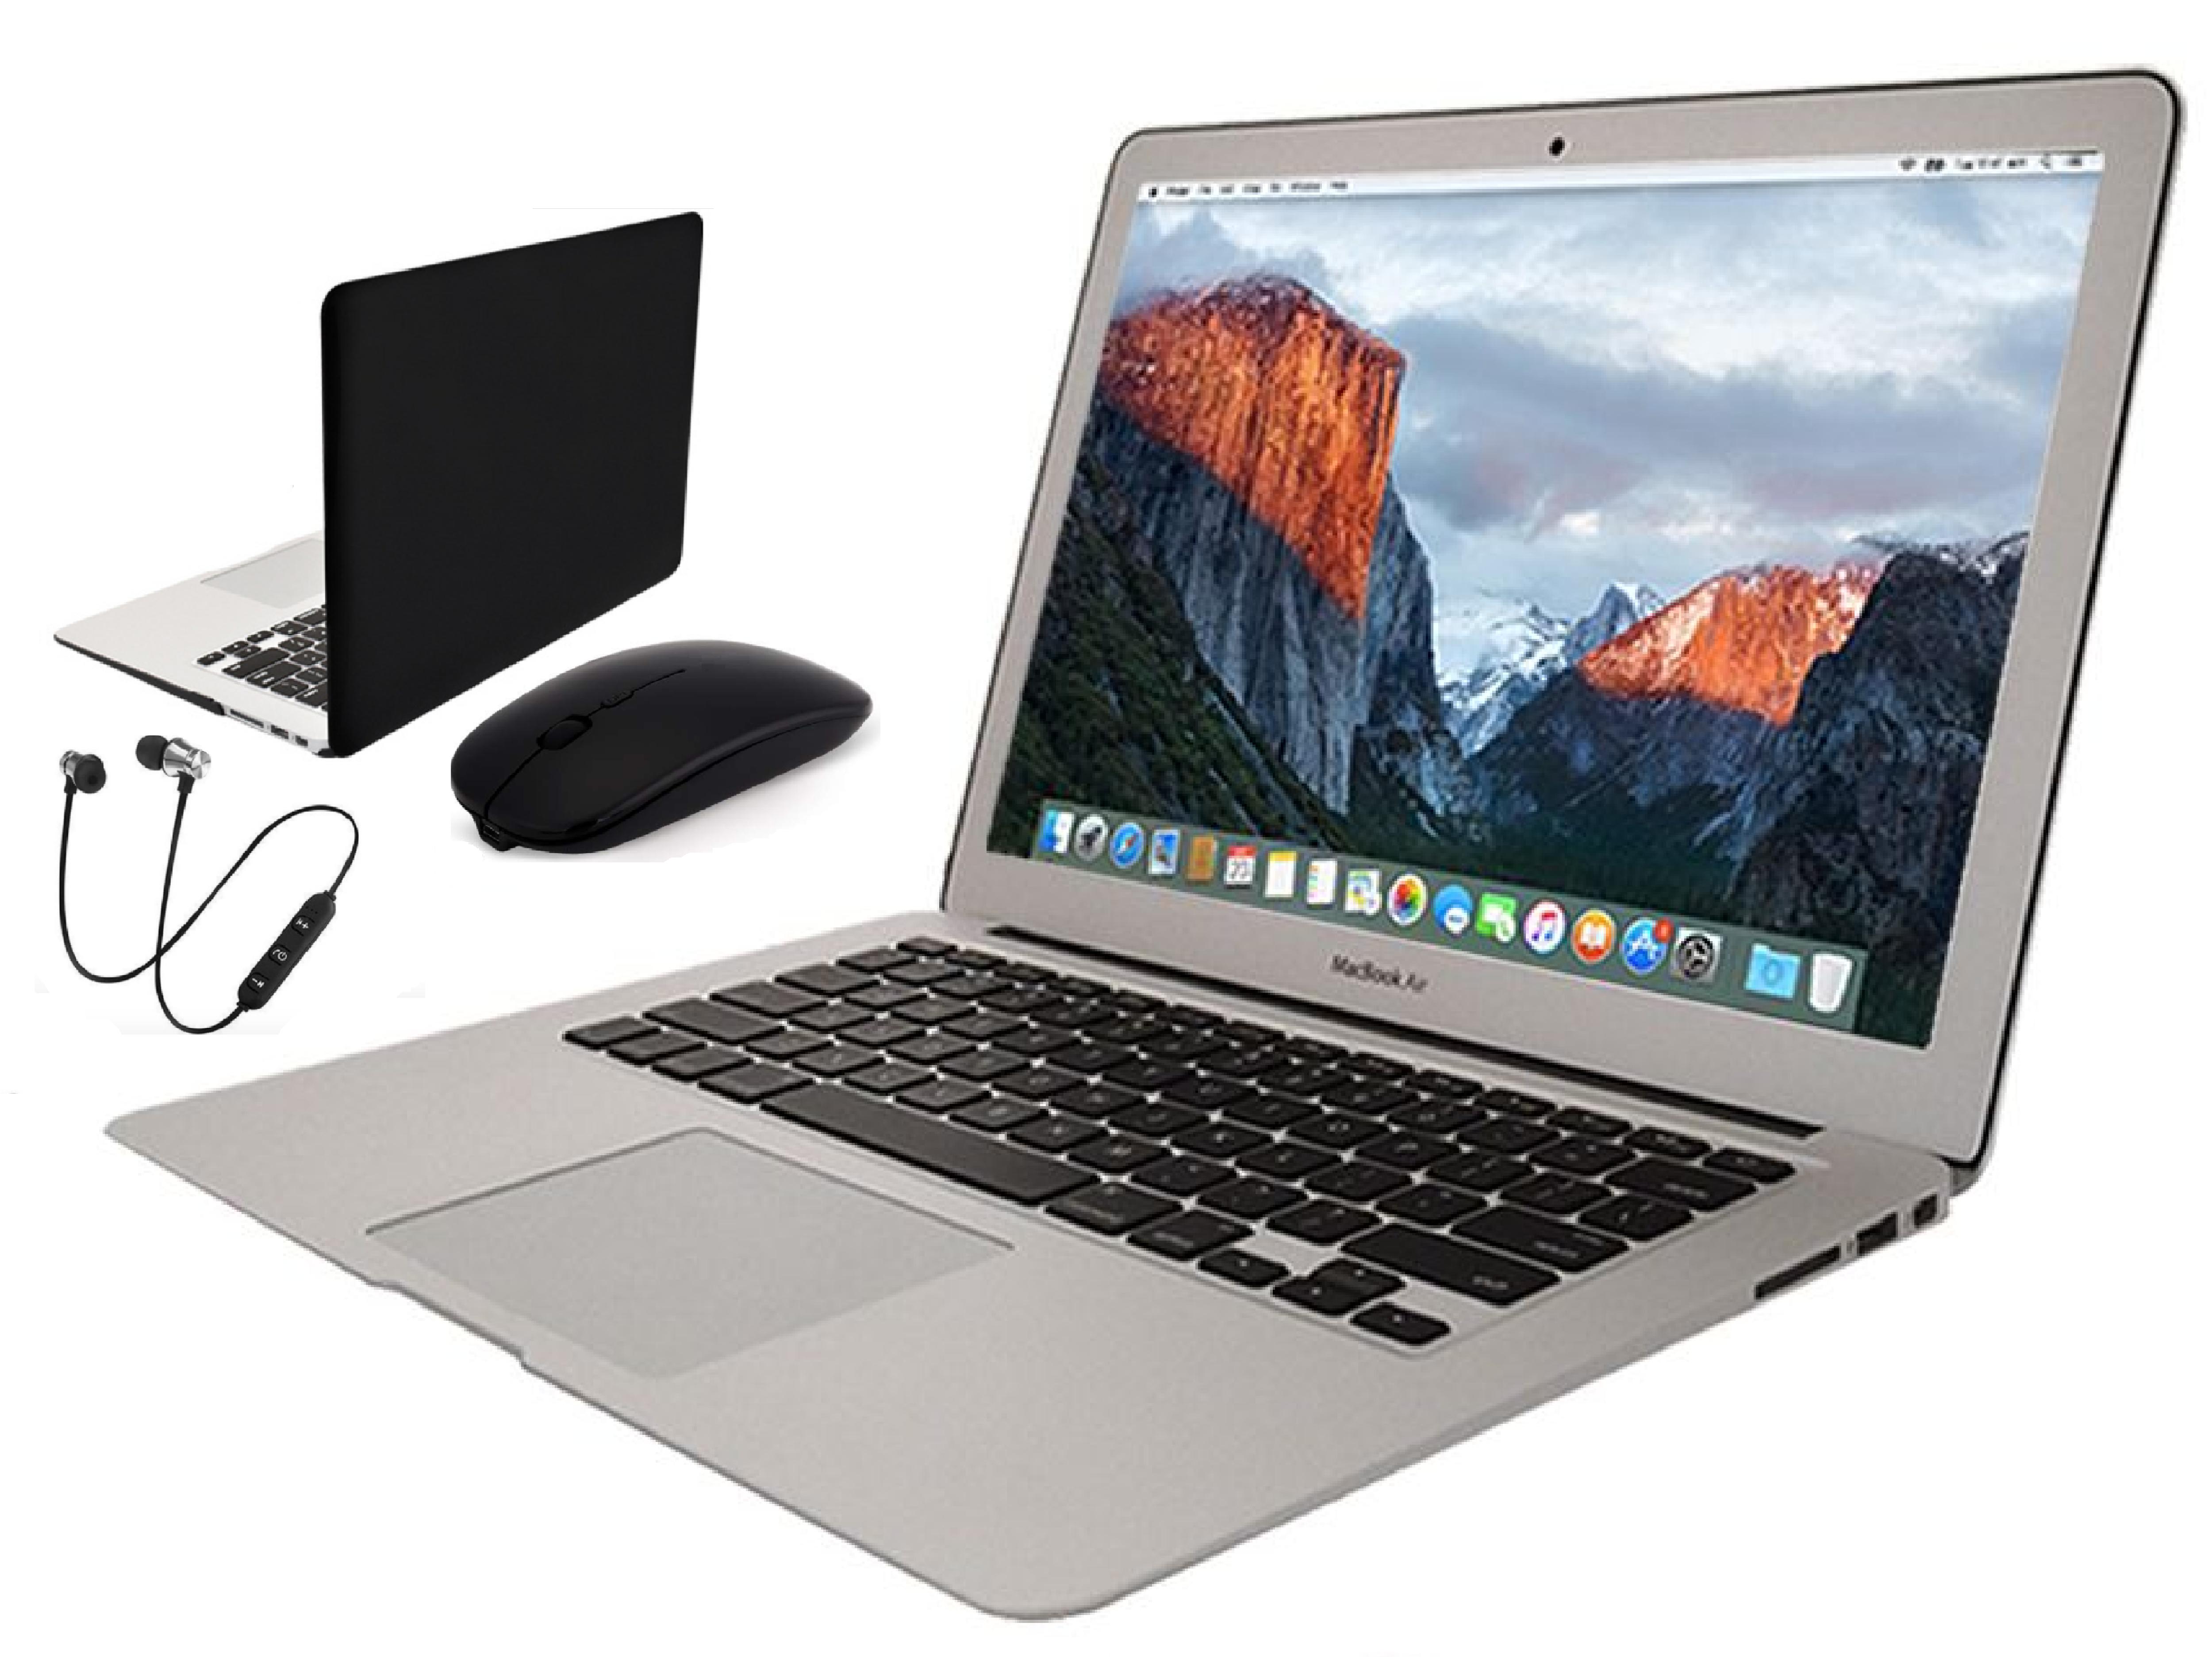 Apple Macbook Air Bundle 11 6 Inch Retina Display 4gb Ram 128gb Ssd Includes Wireless Headset Generic Case Bluetooth Mouse 1 Year Warranty Refurbish In 2021 Apple Macbook Apple Macbook Air Macbook